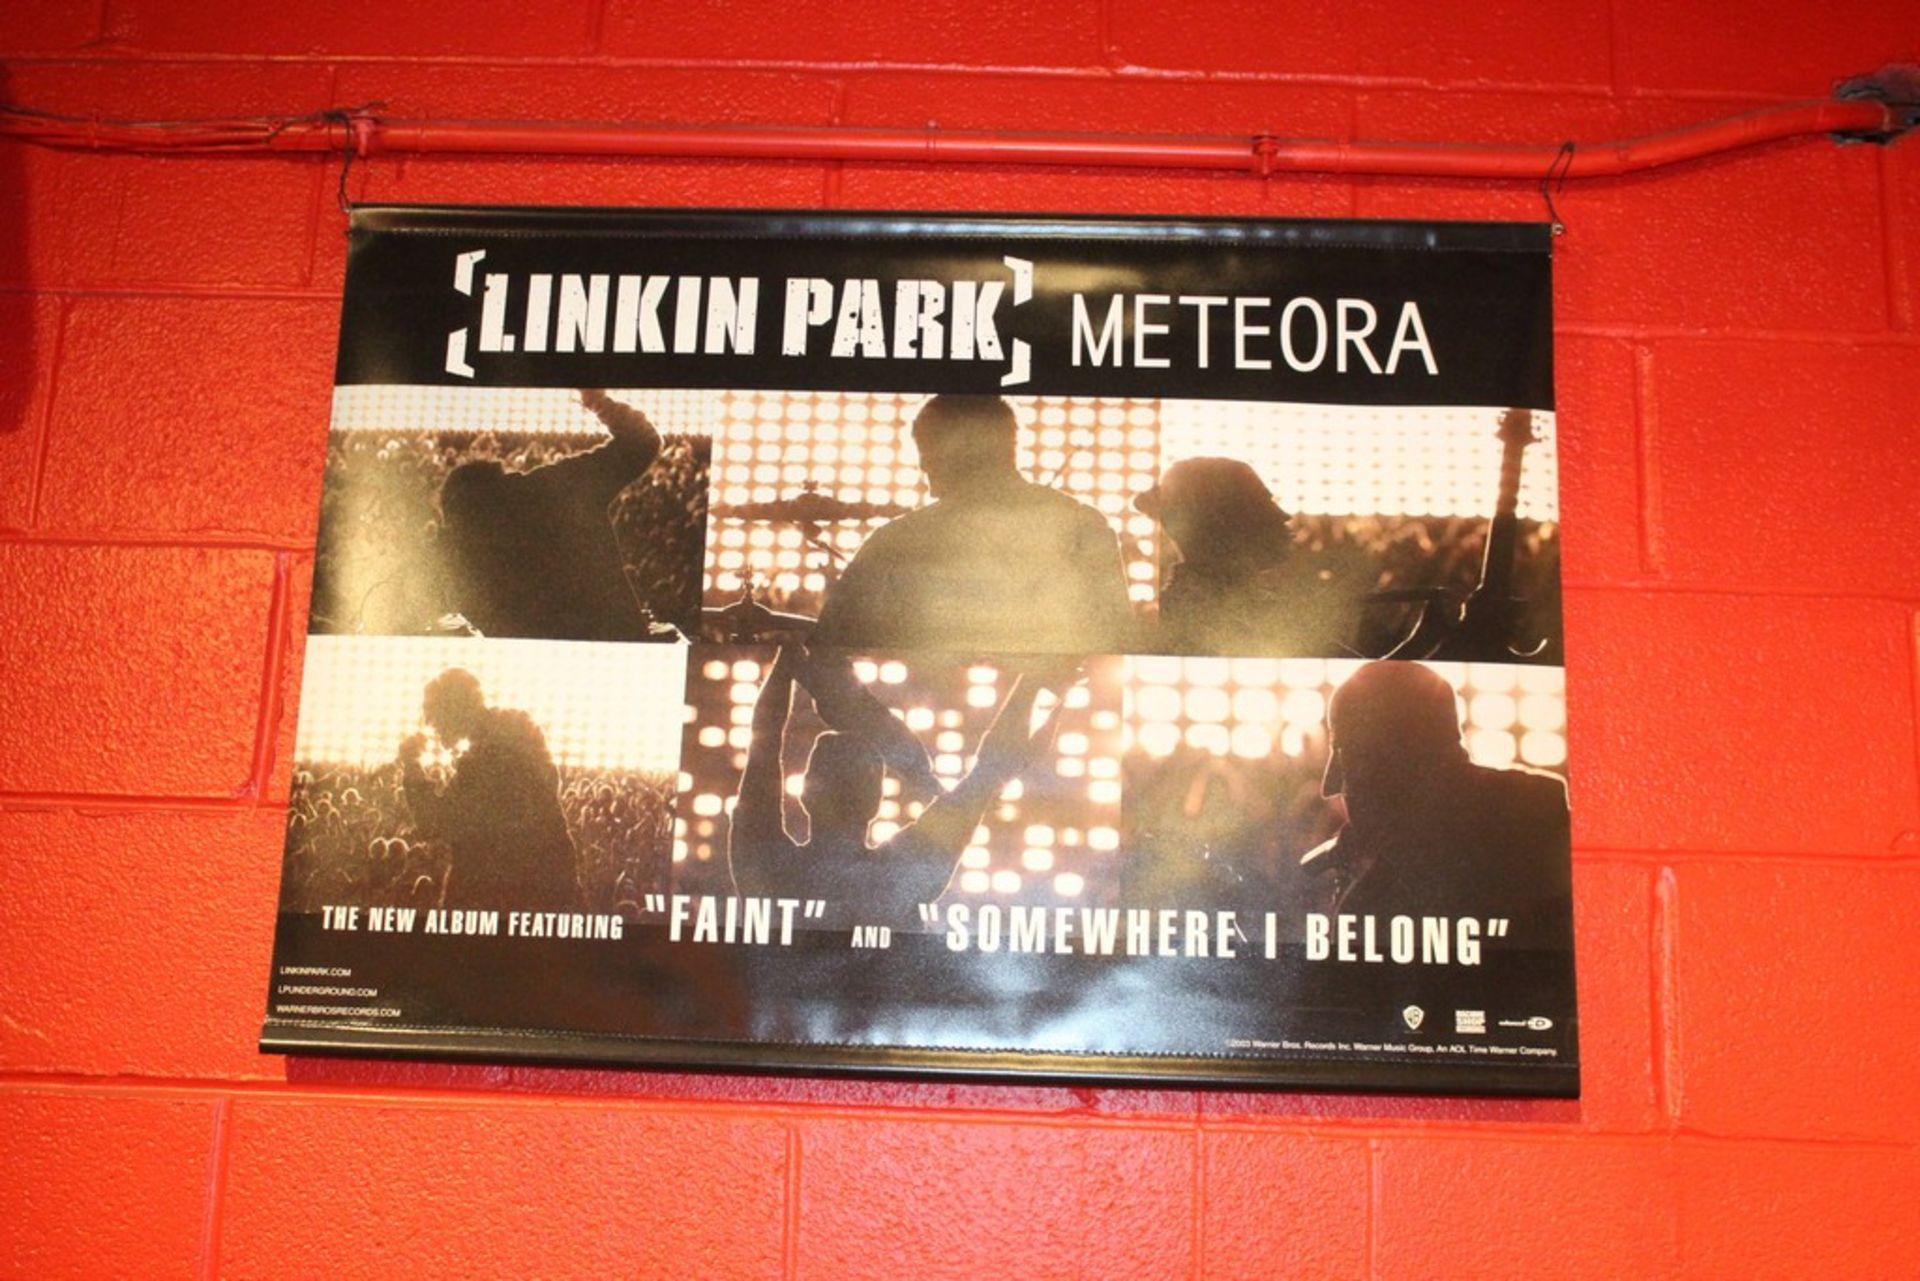 Lot 2009 - Linkin Park Meteora Plastic Scrolling Poster, Cabaret Metro Feb 18